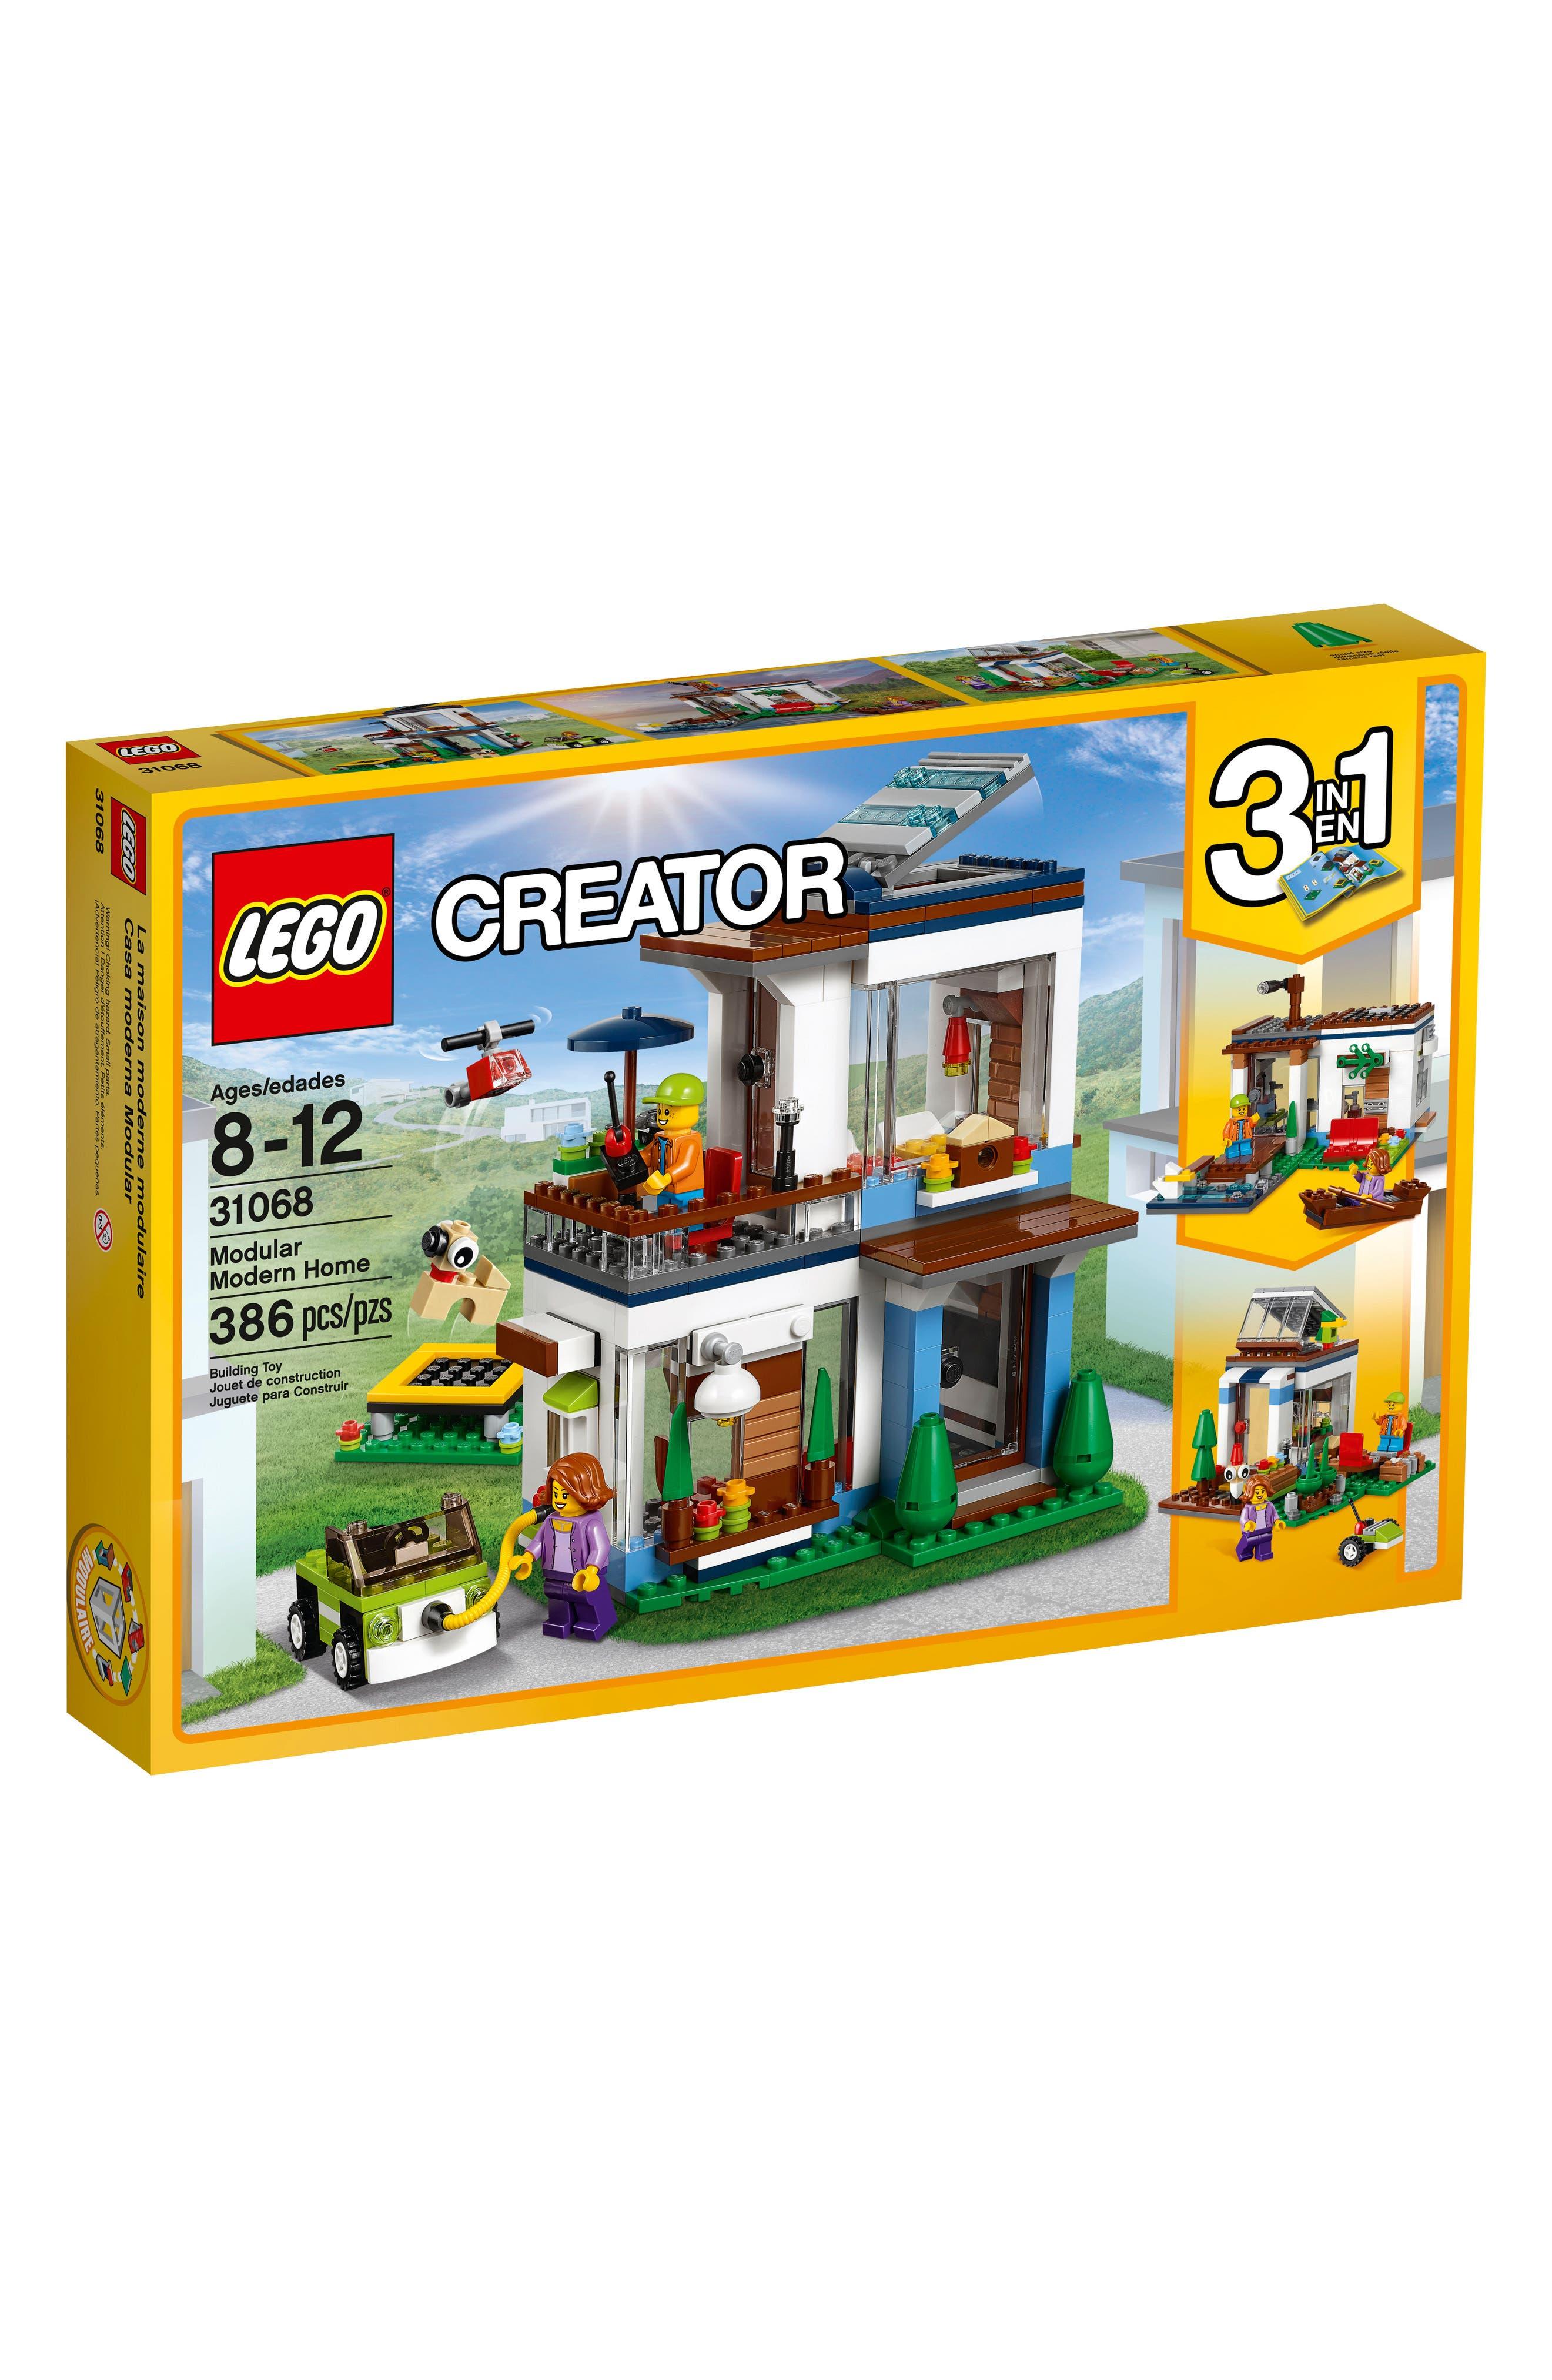 Creator 3-in-1 Modular Modern Home Play Set - 31068,                         Main,                         color,